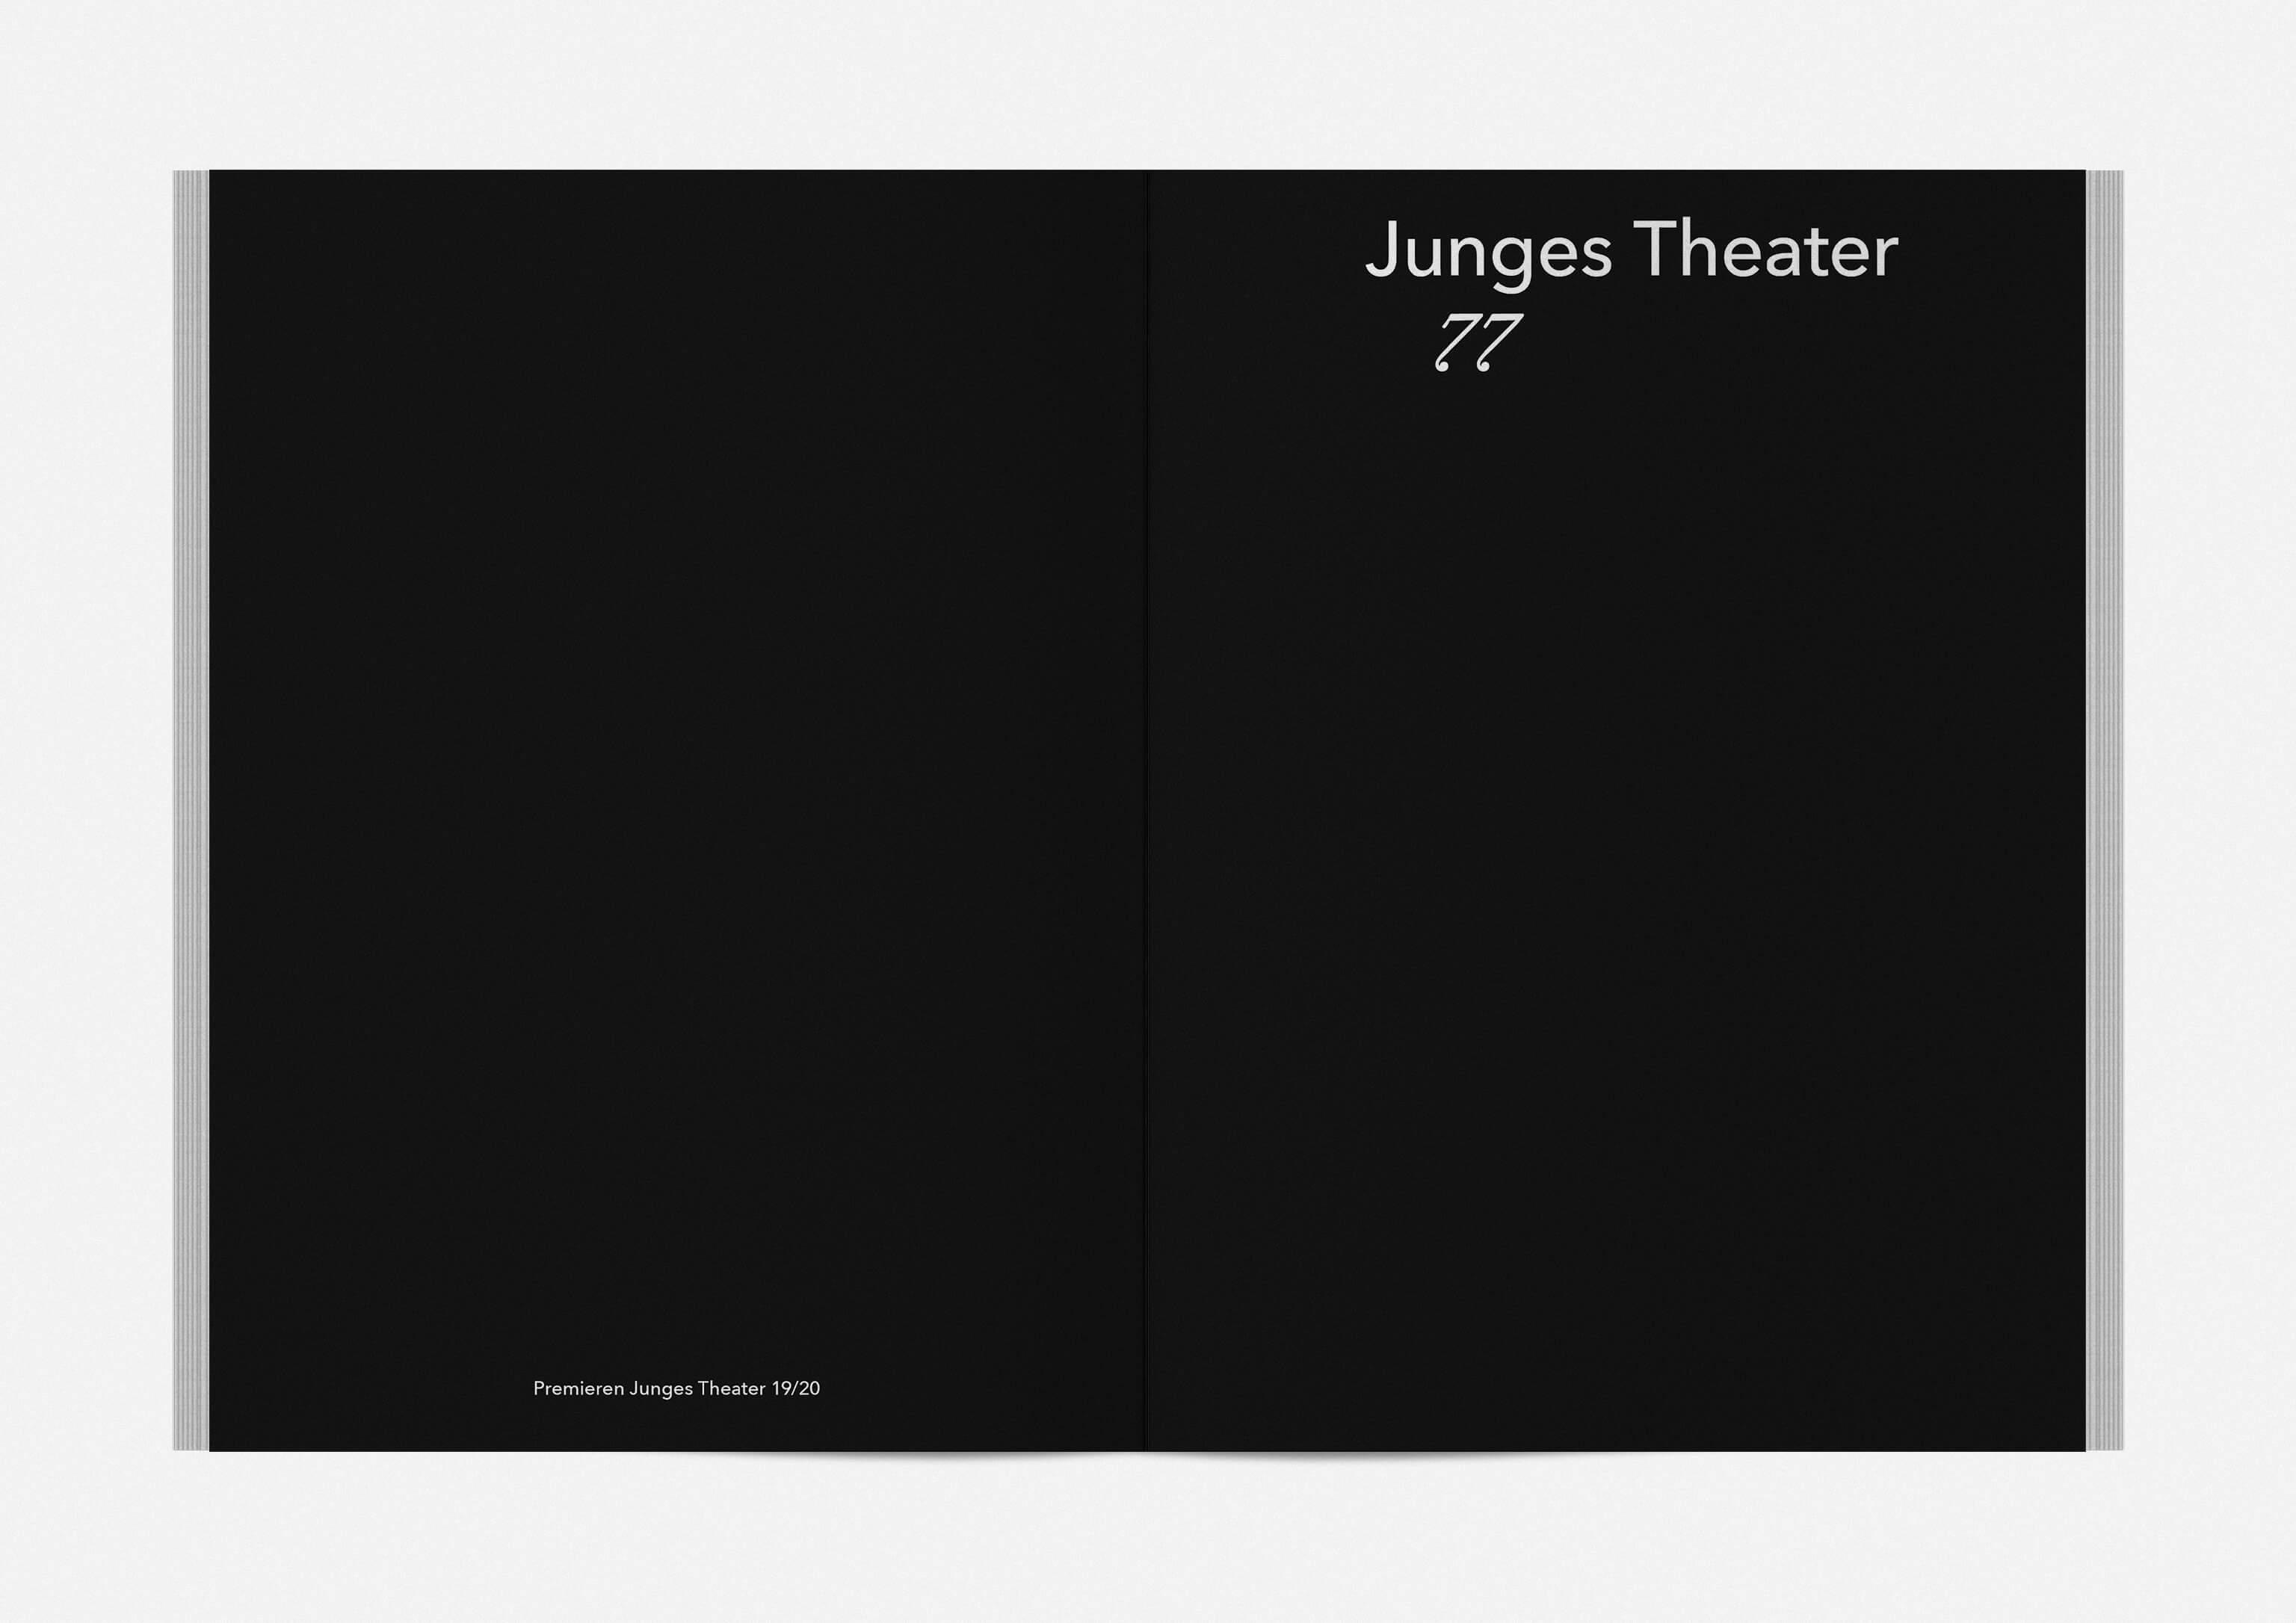 https://neuegestaltung.de/media/pages/clients/theater-erlangen-season-program-19-20/143f49c026-1597415332/te_szh_19_20_innenseite_76_77_ng.jpg